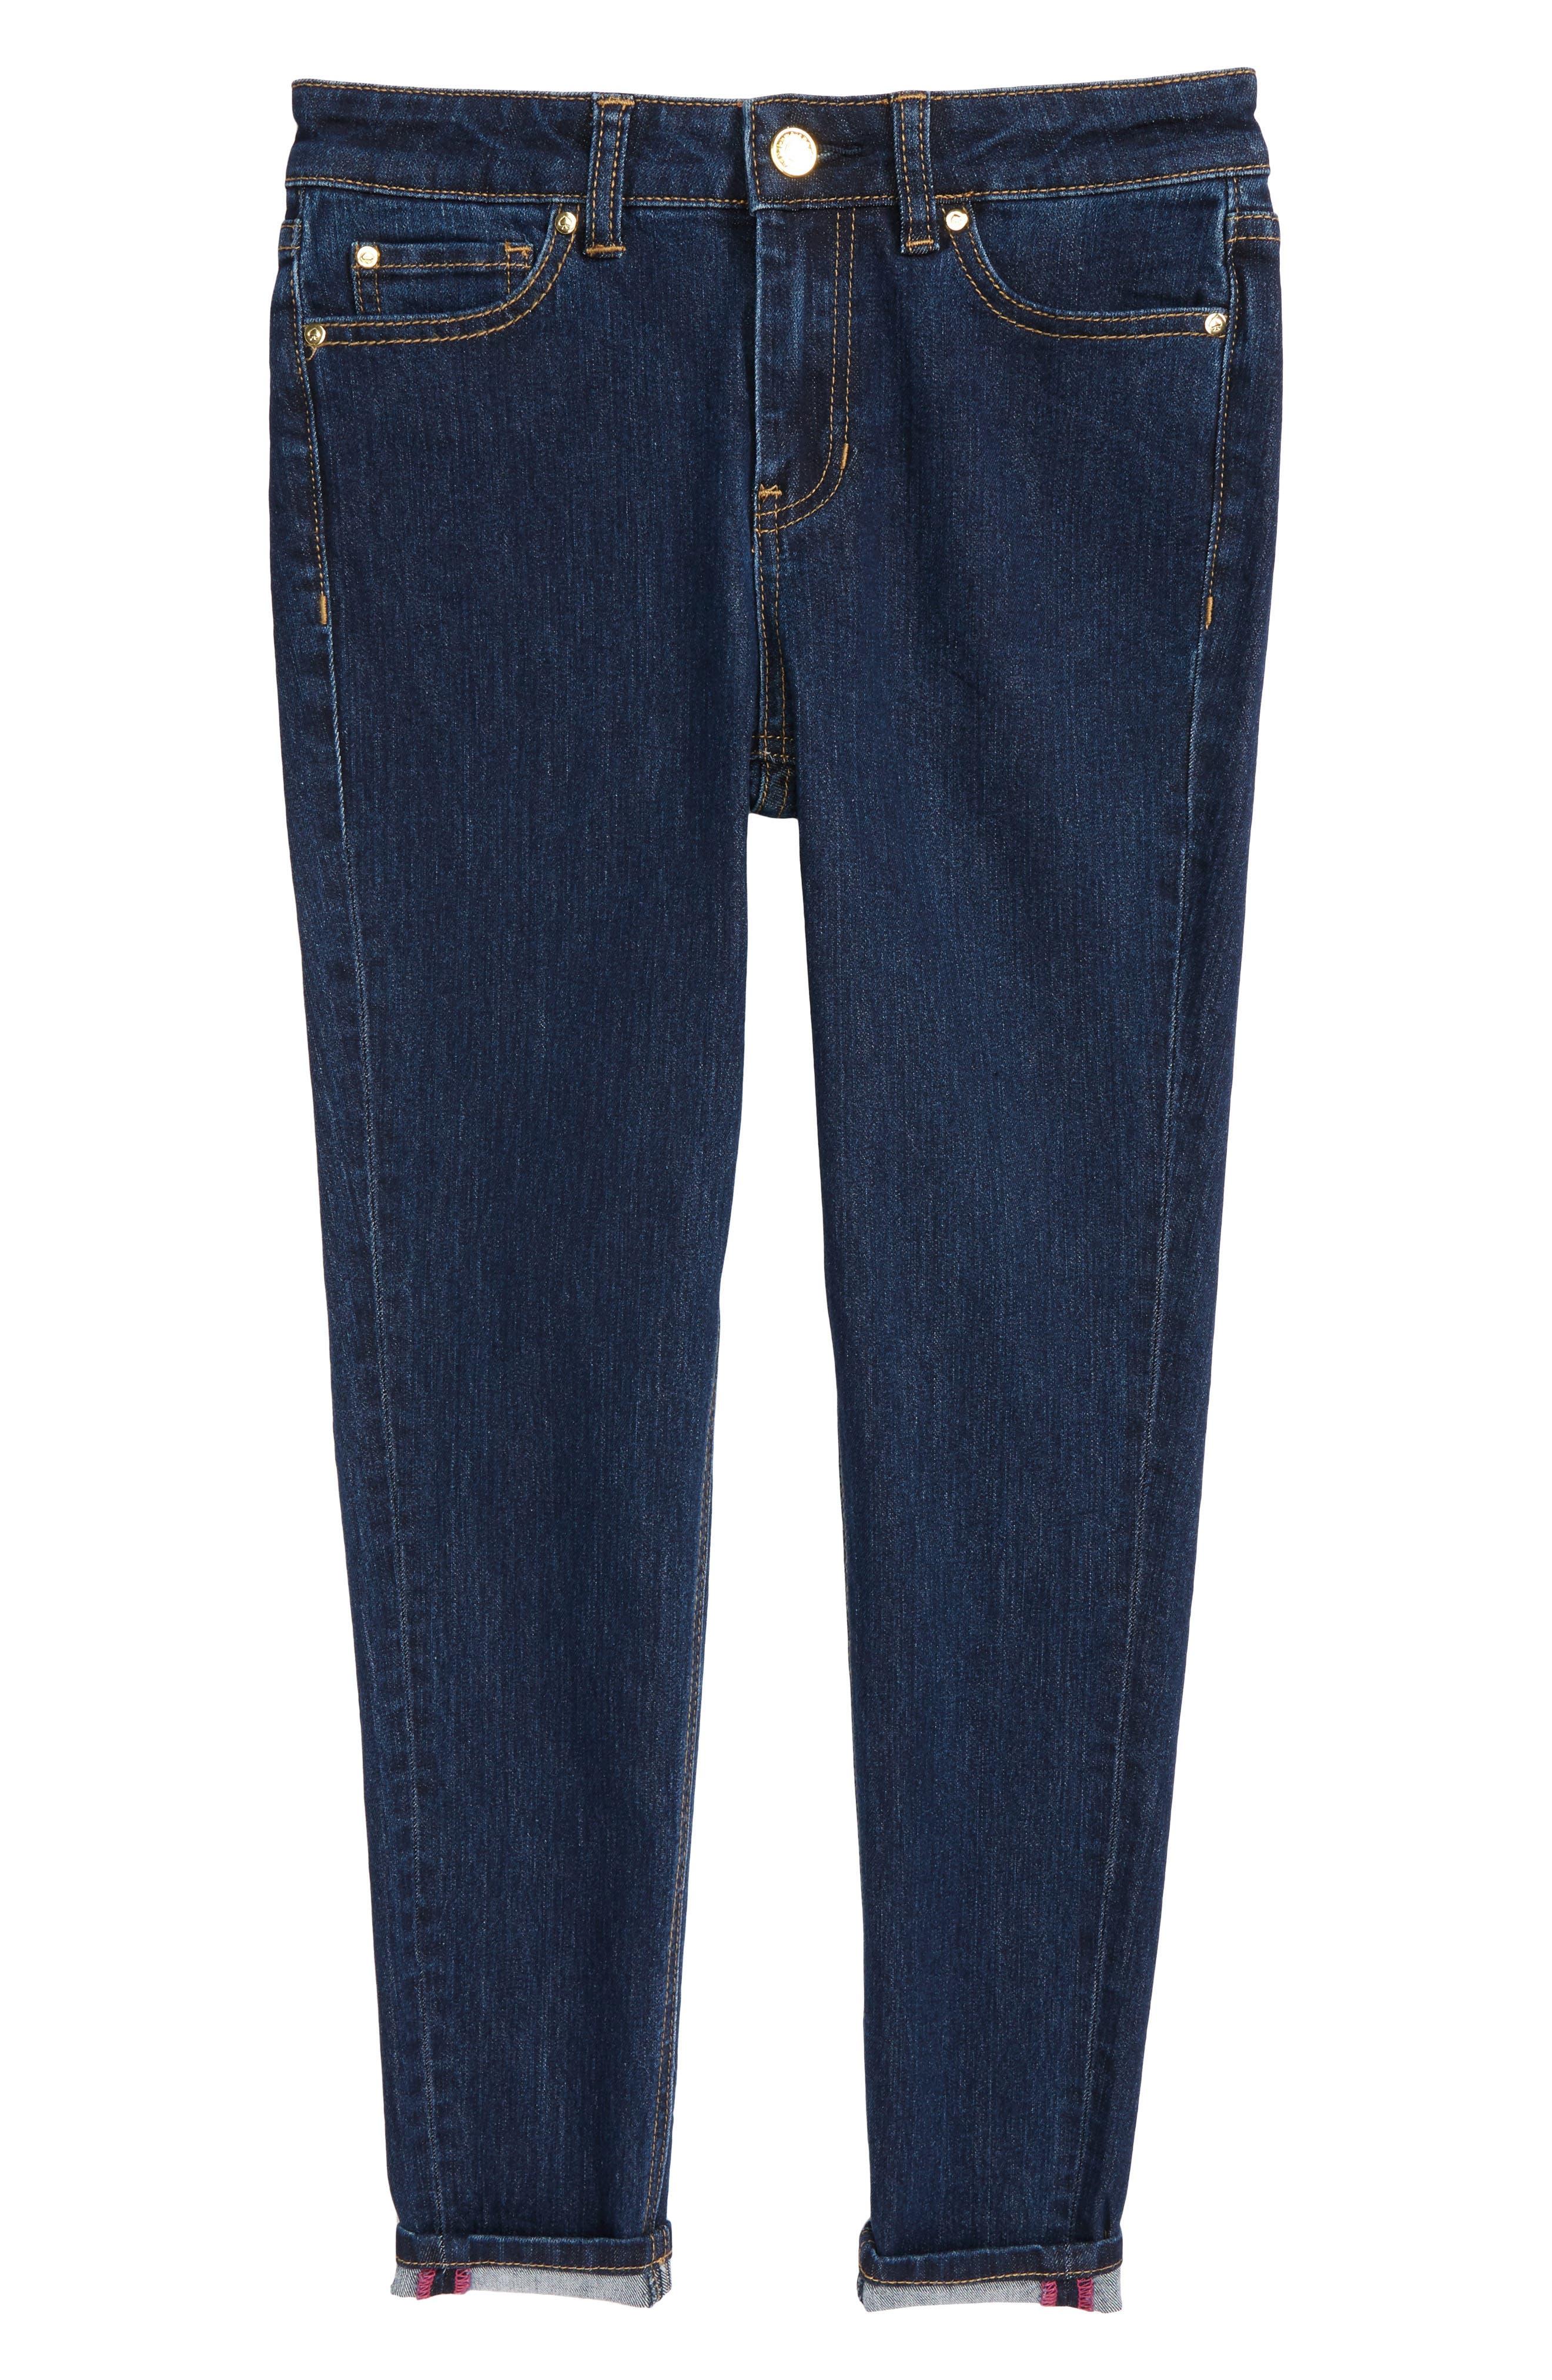 skinny jeans,                             Main thumbnail 1, color,                             Denim Indigo